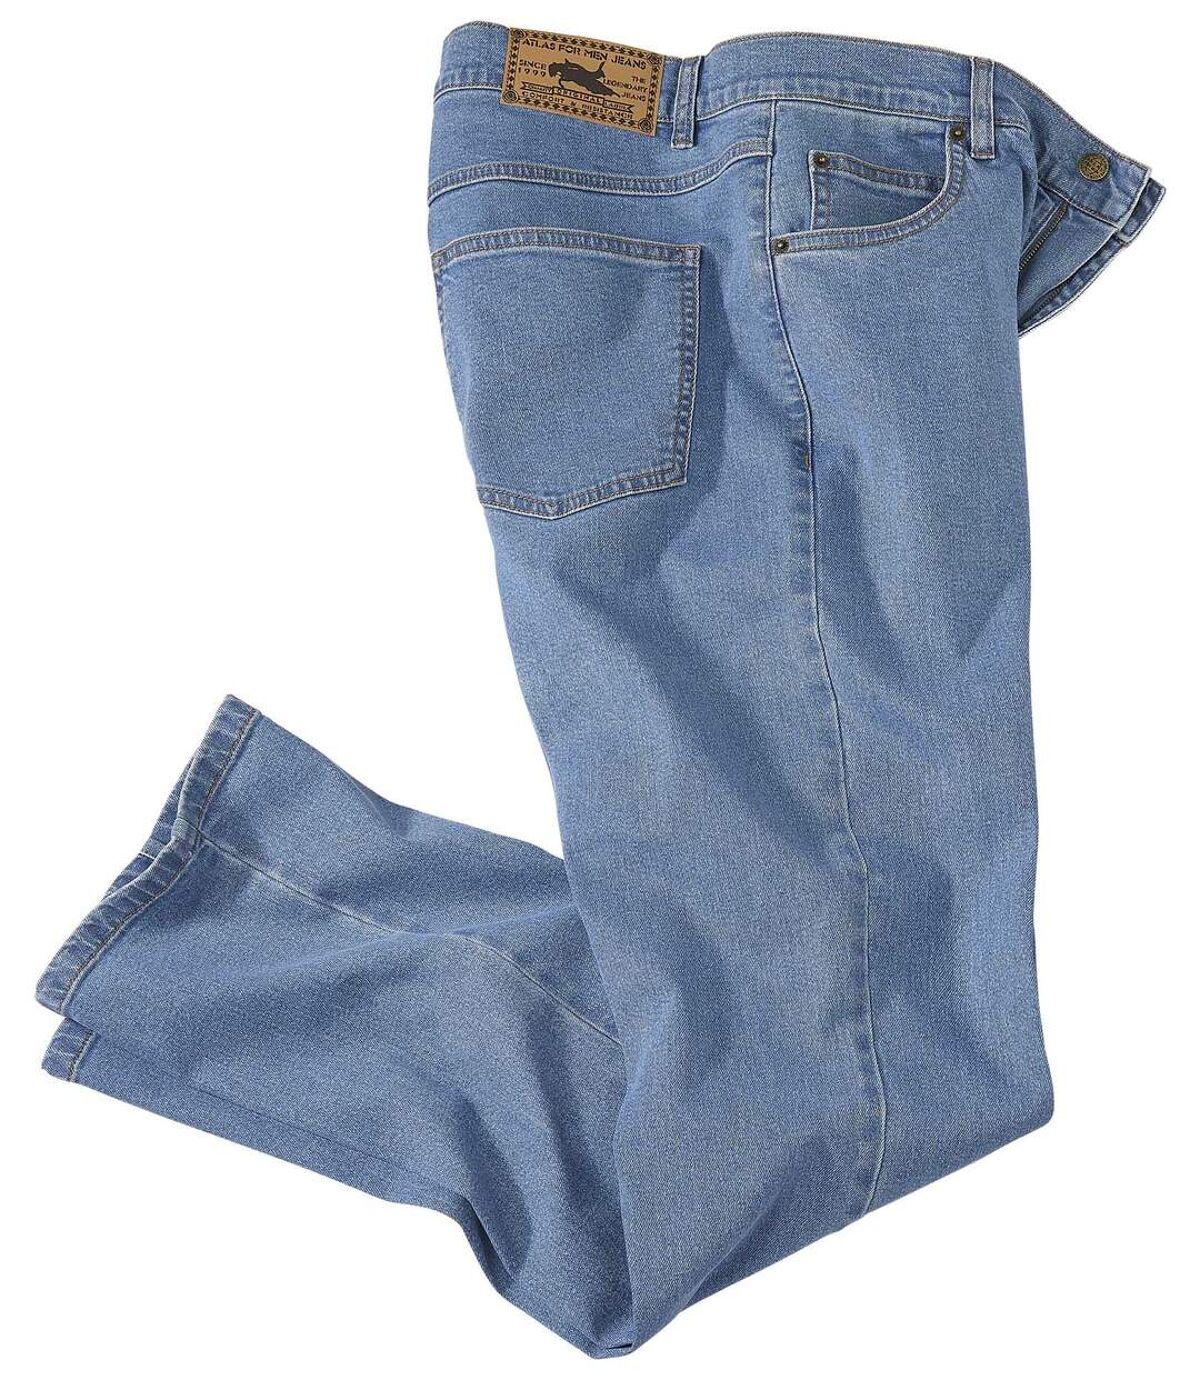 Men's Blue Stretch Jeans Atlas For Men